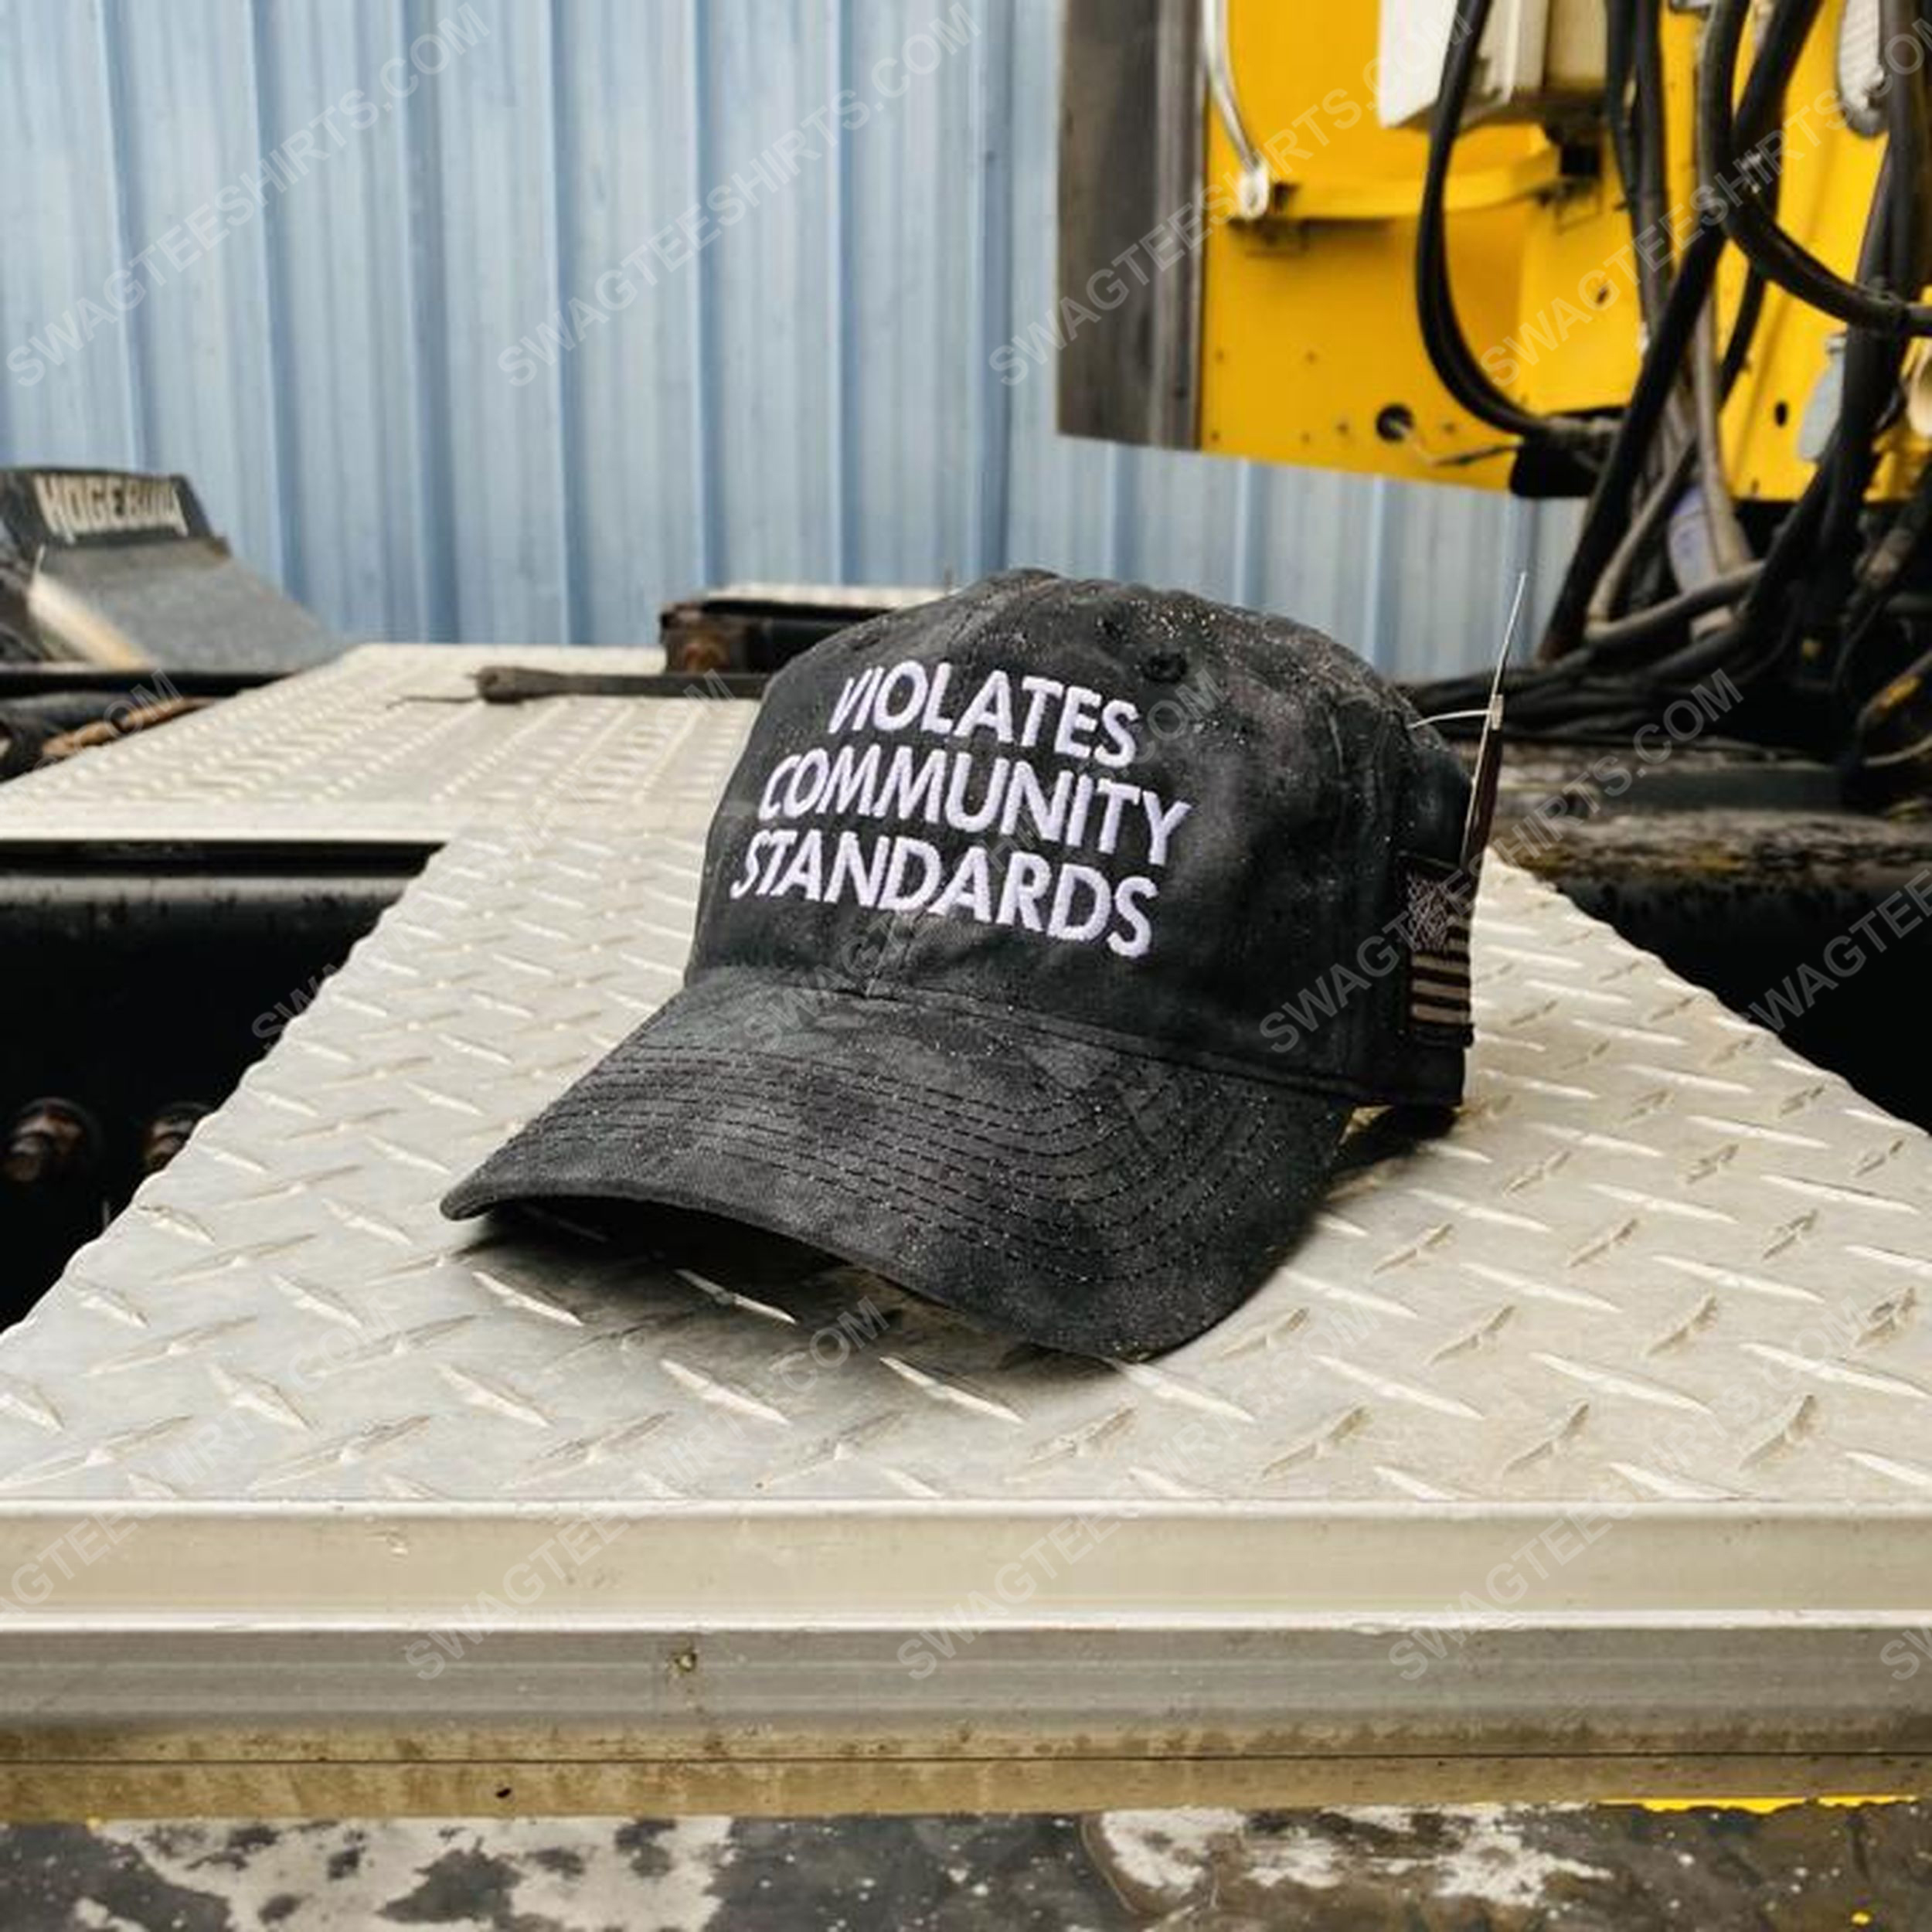 Violates community standards full print classic hat 1 - Copy